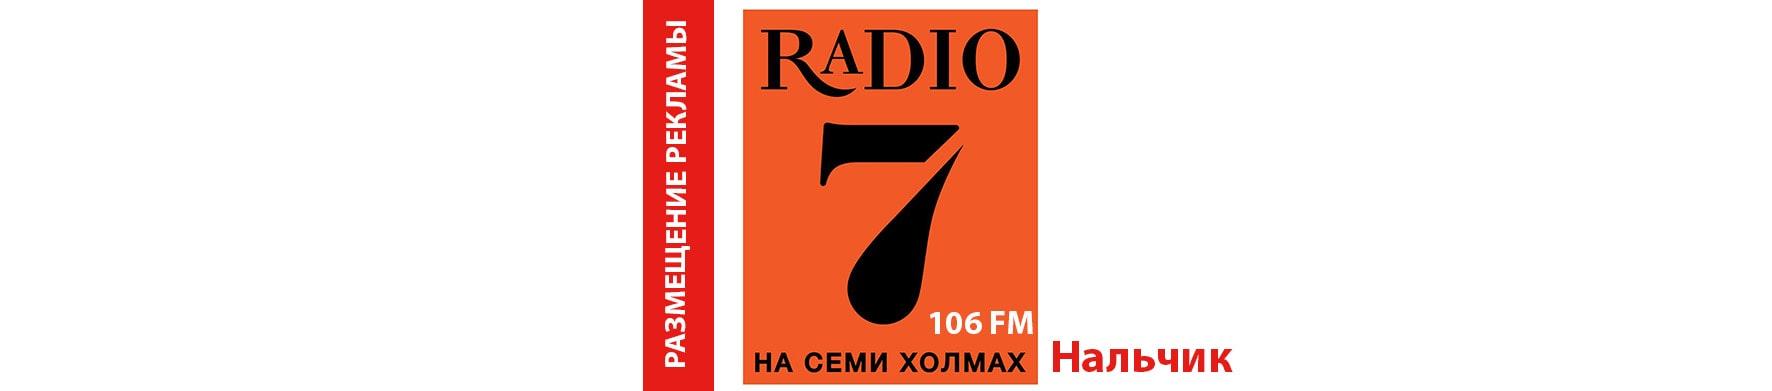 Реклама на радио в Кабардино-Балкарии Радио 7